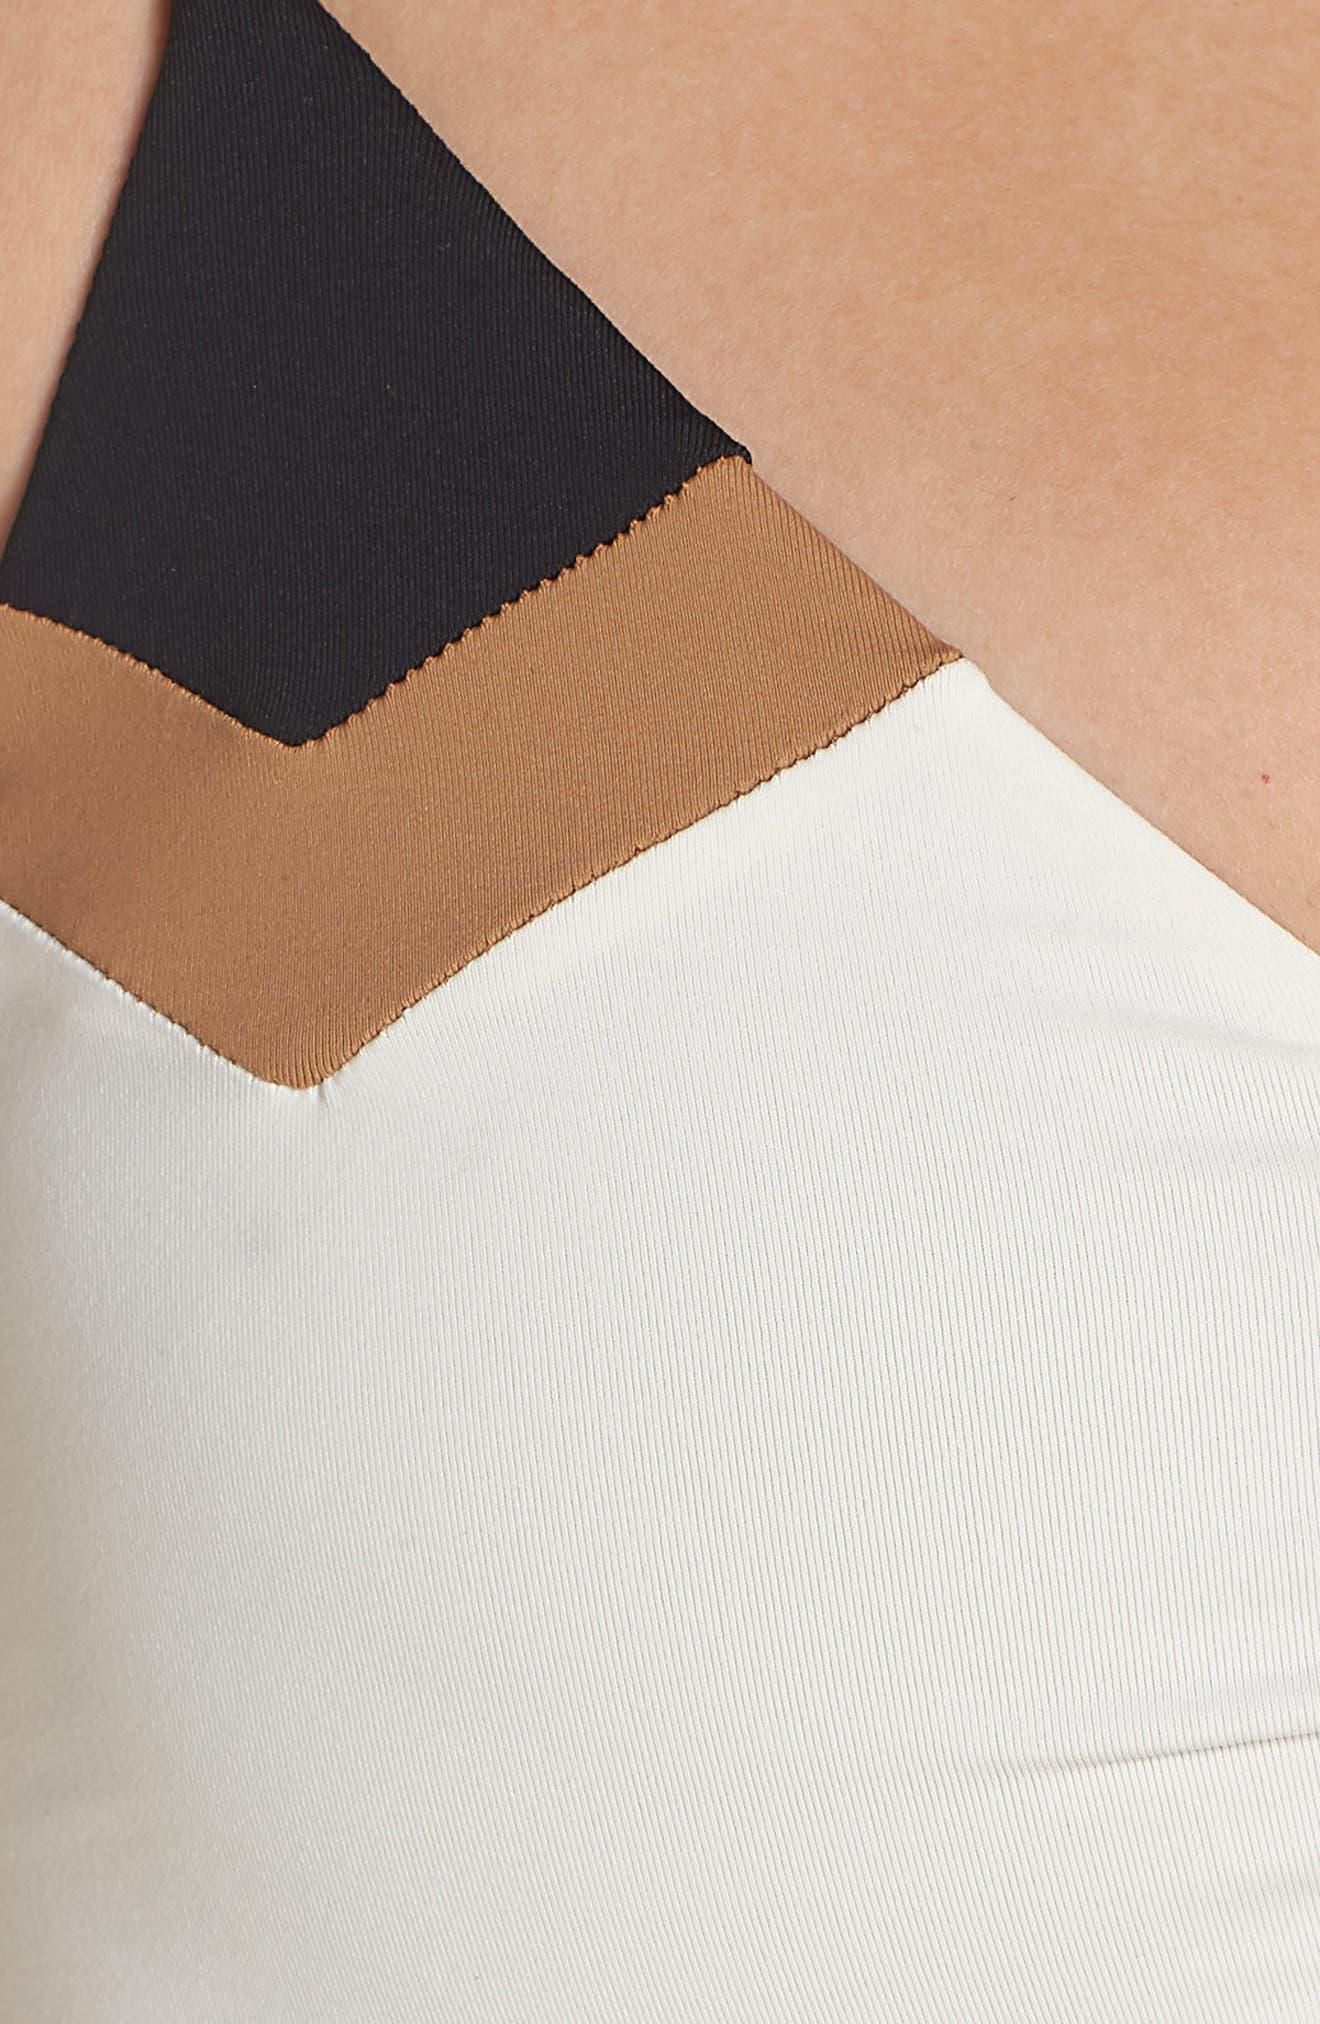 'Haley' Reversible Bikini Top,                             Alternate thumbnail 6, color,                             Cream/ Black/ Camel